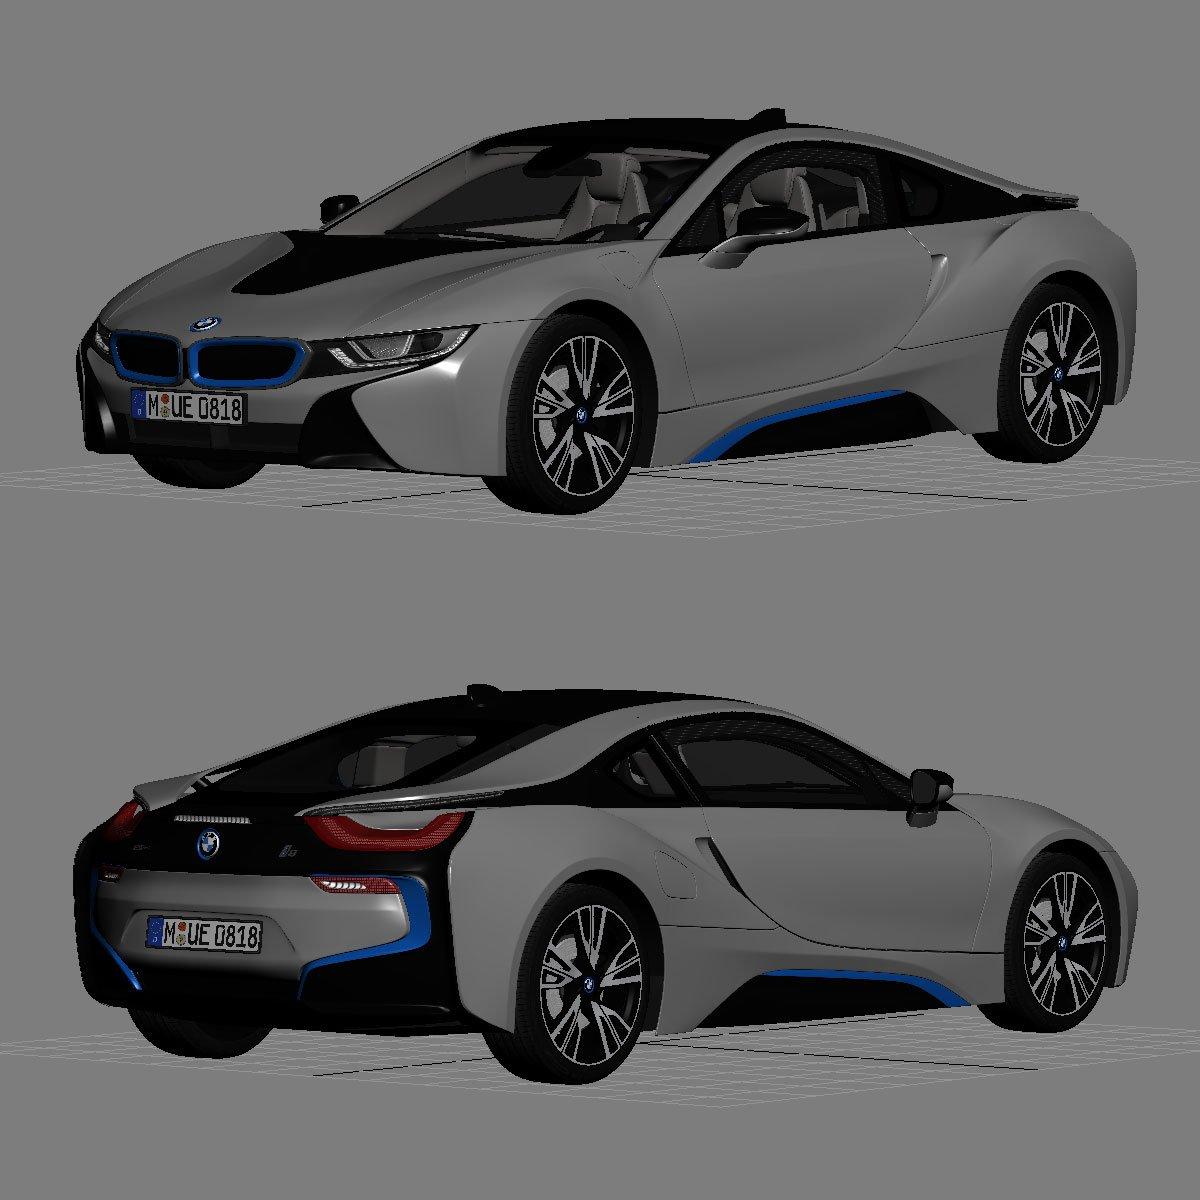 Bmw I8 2015 3d Model In Compact Cars 3dexport